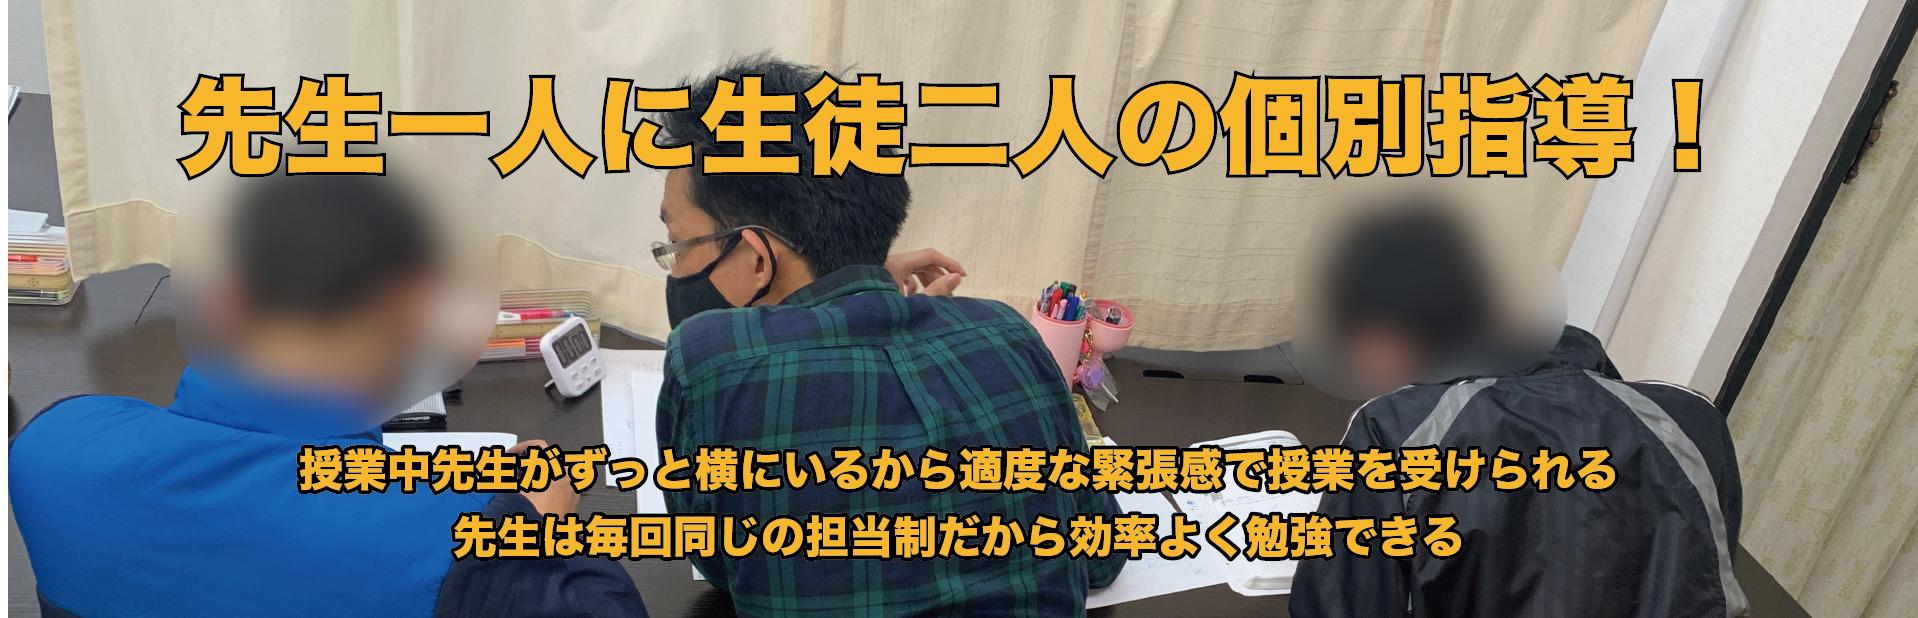 https://chicora-gakuen.jp/introduction/